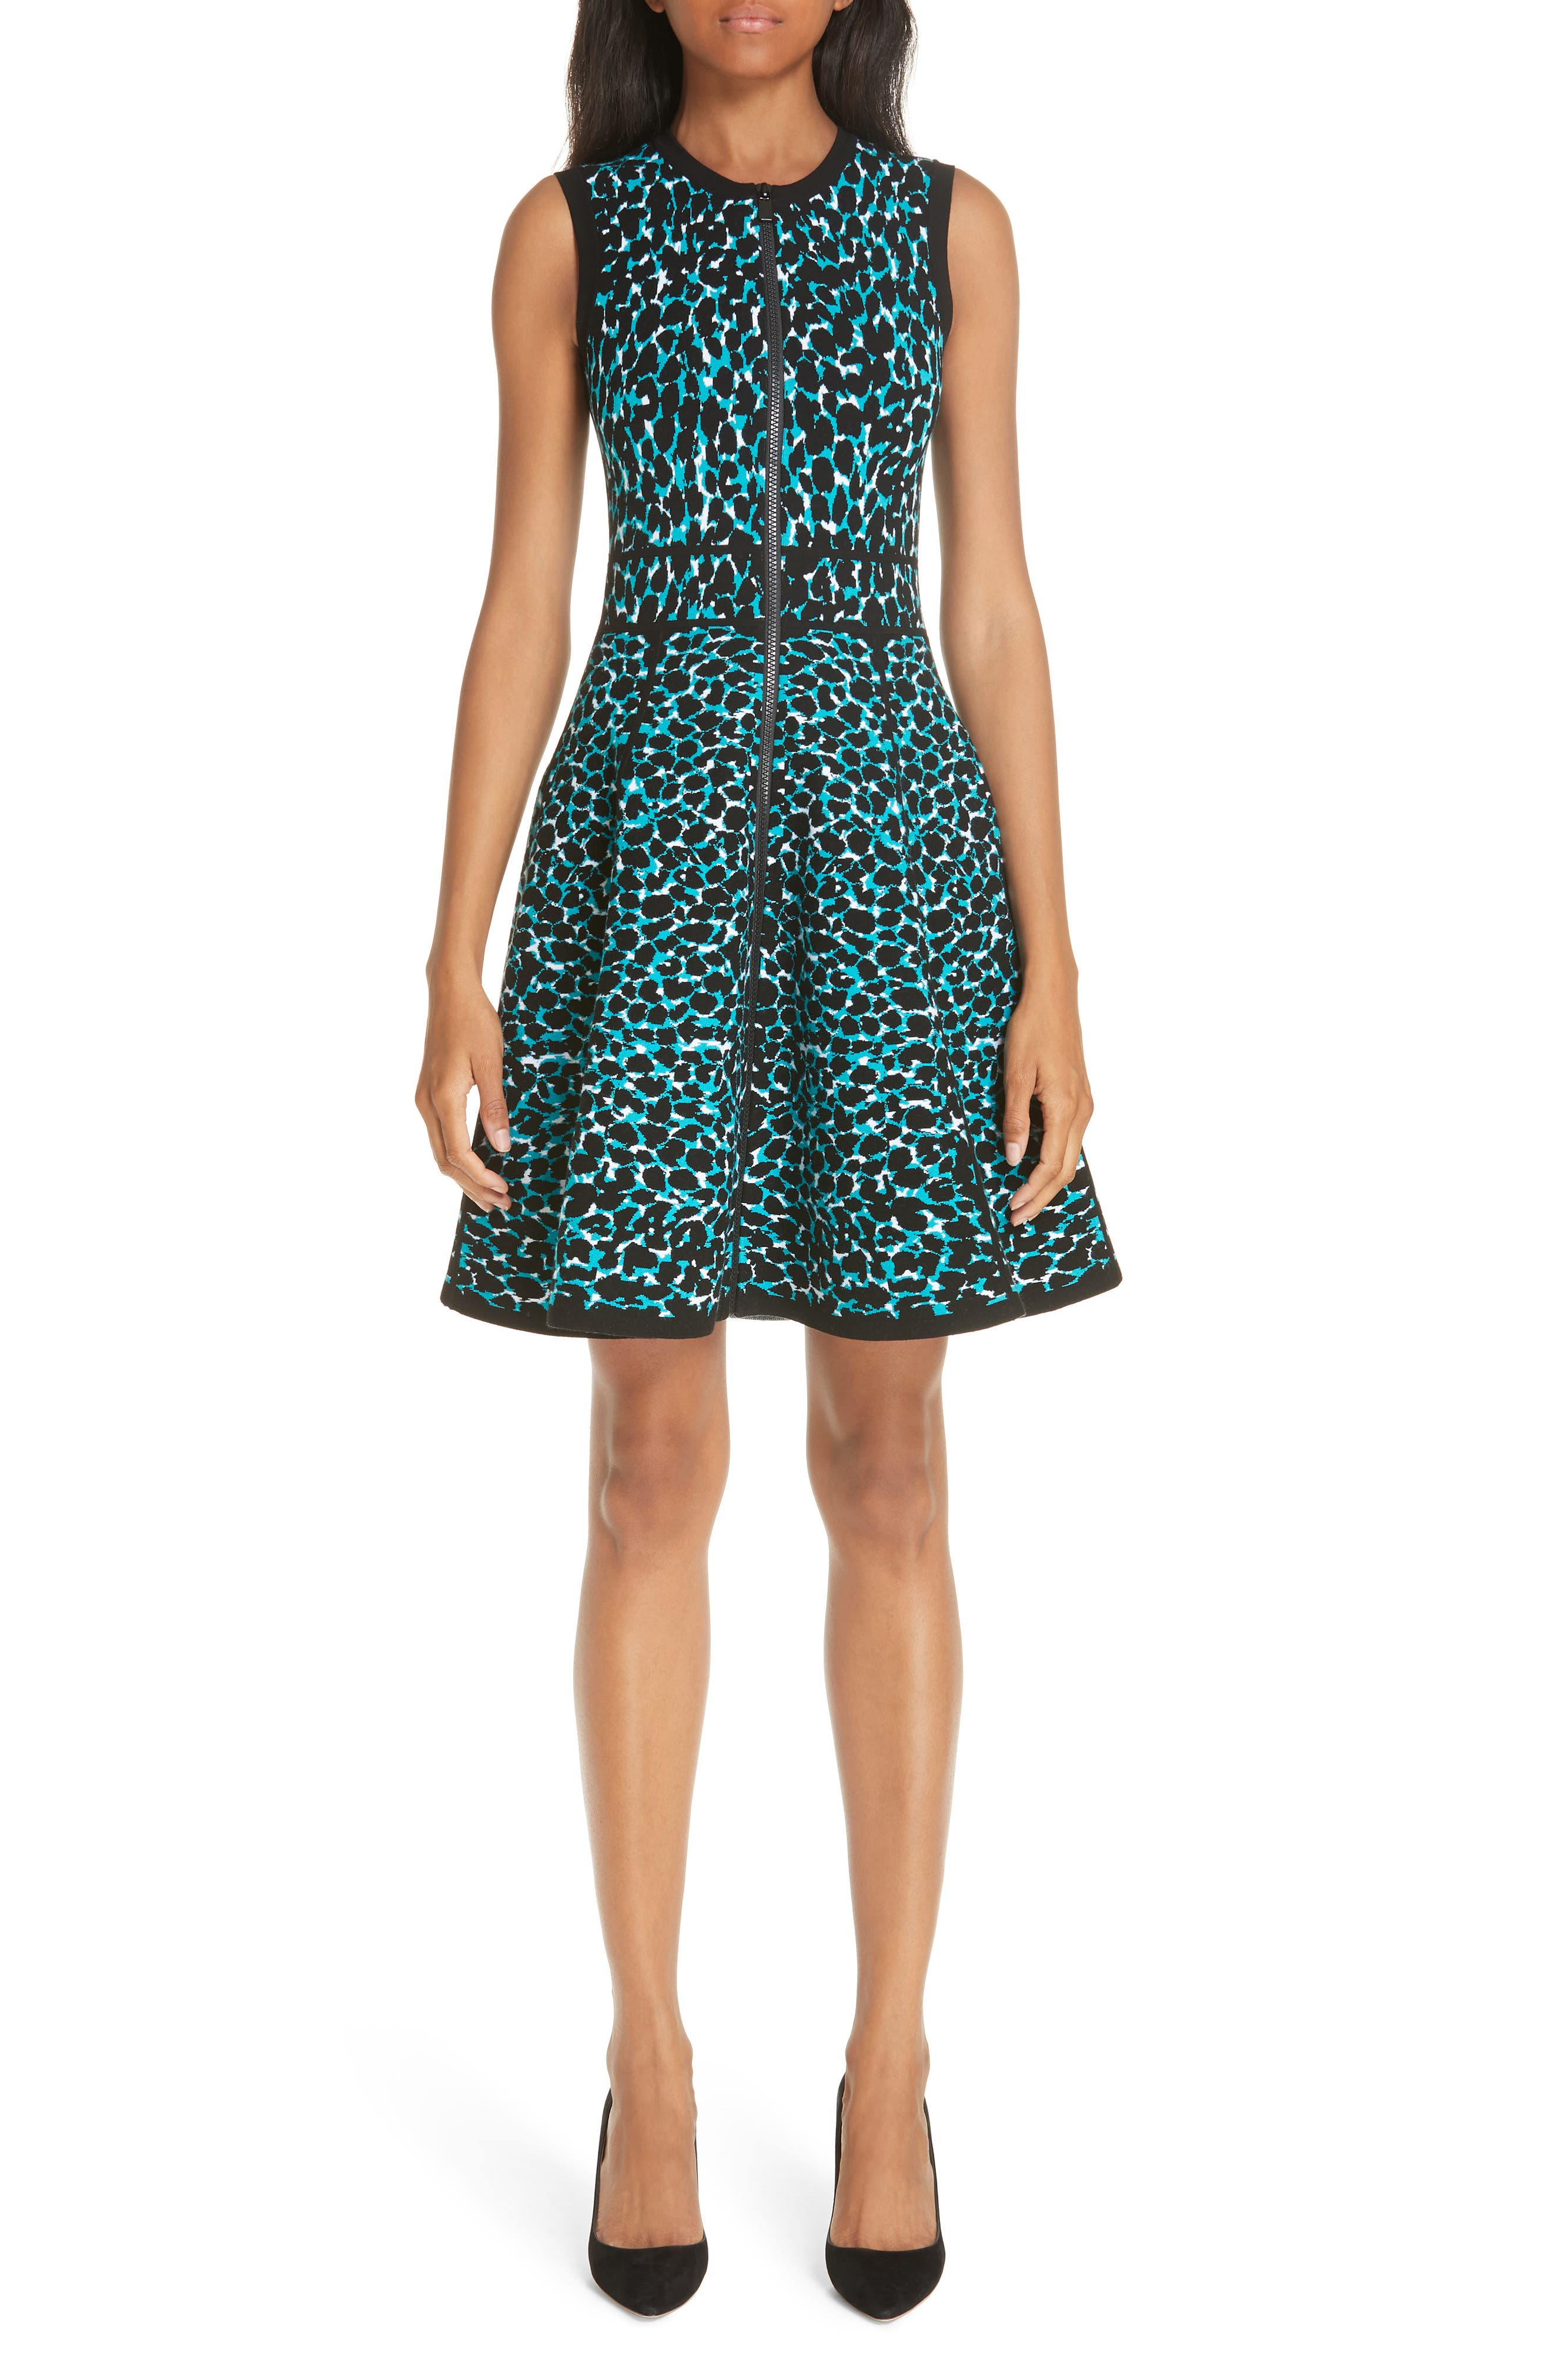 Michael Kors Leopard Print Zip Front Fit & Flare Dress, Green